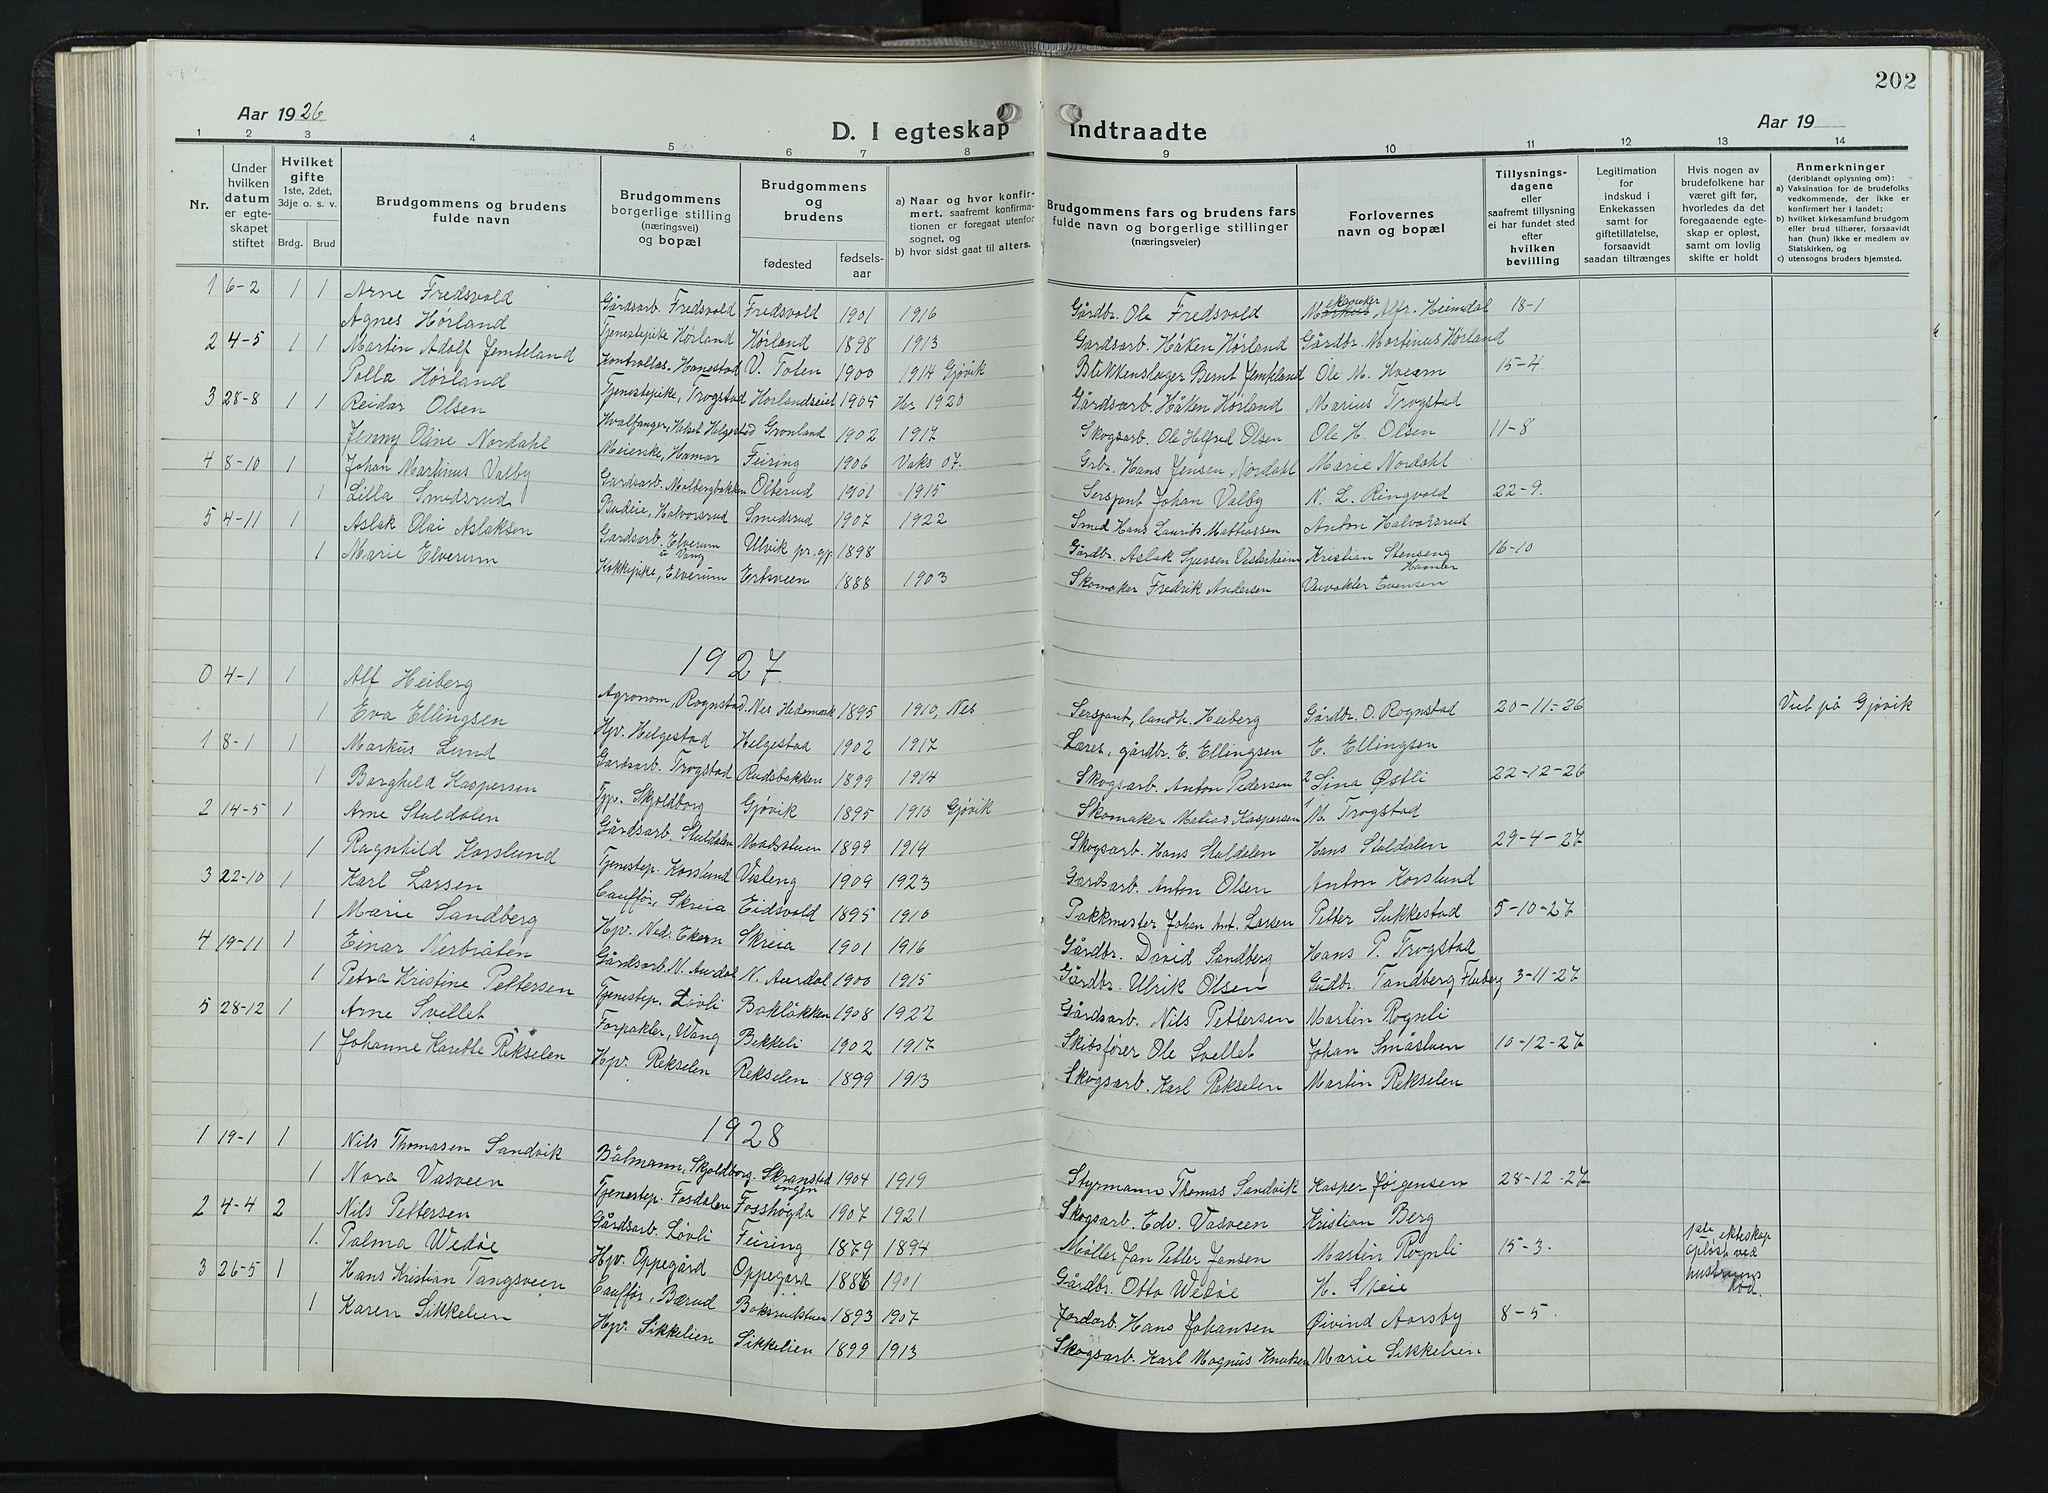 SAH, Balke prestekontor, Klokkerbok nr. 1, 1920-1955, s. 202